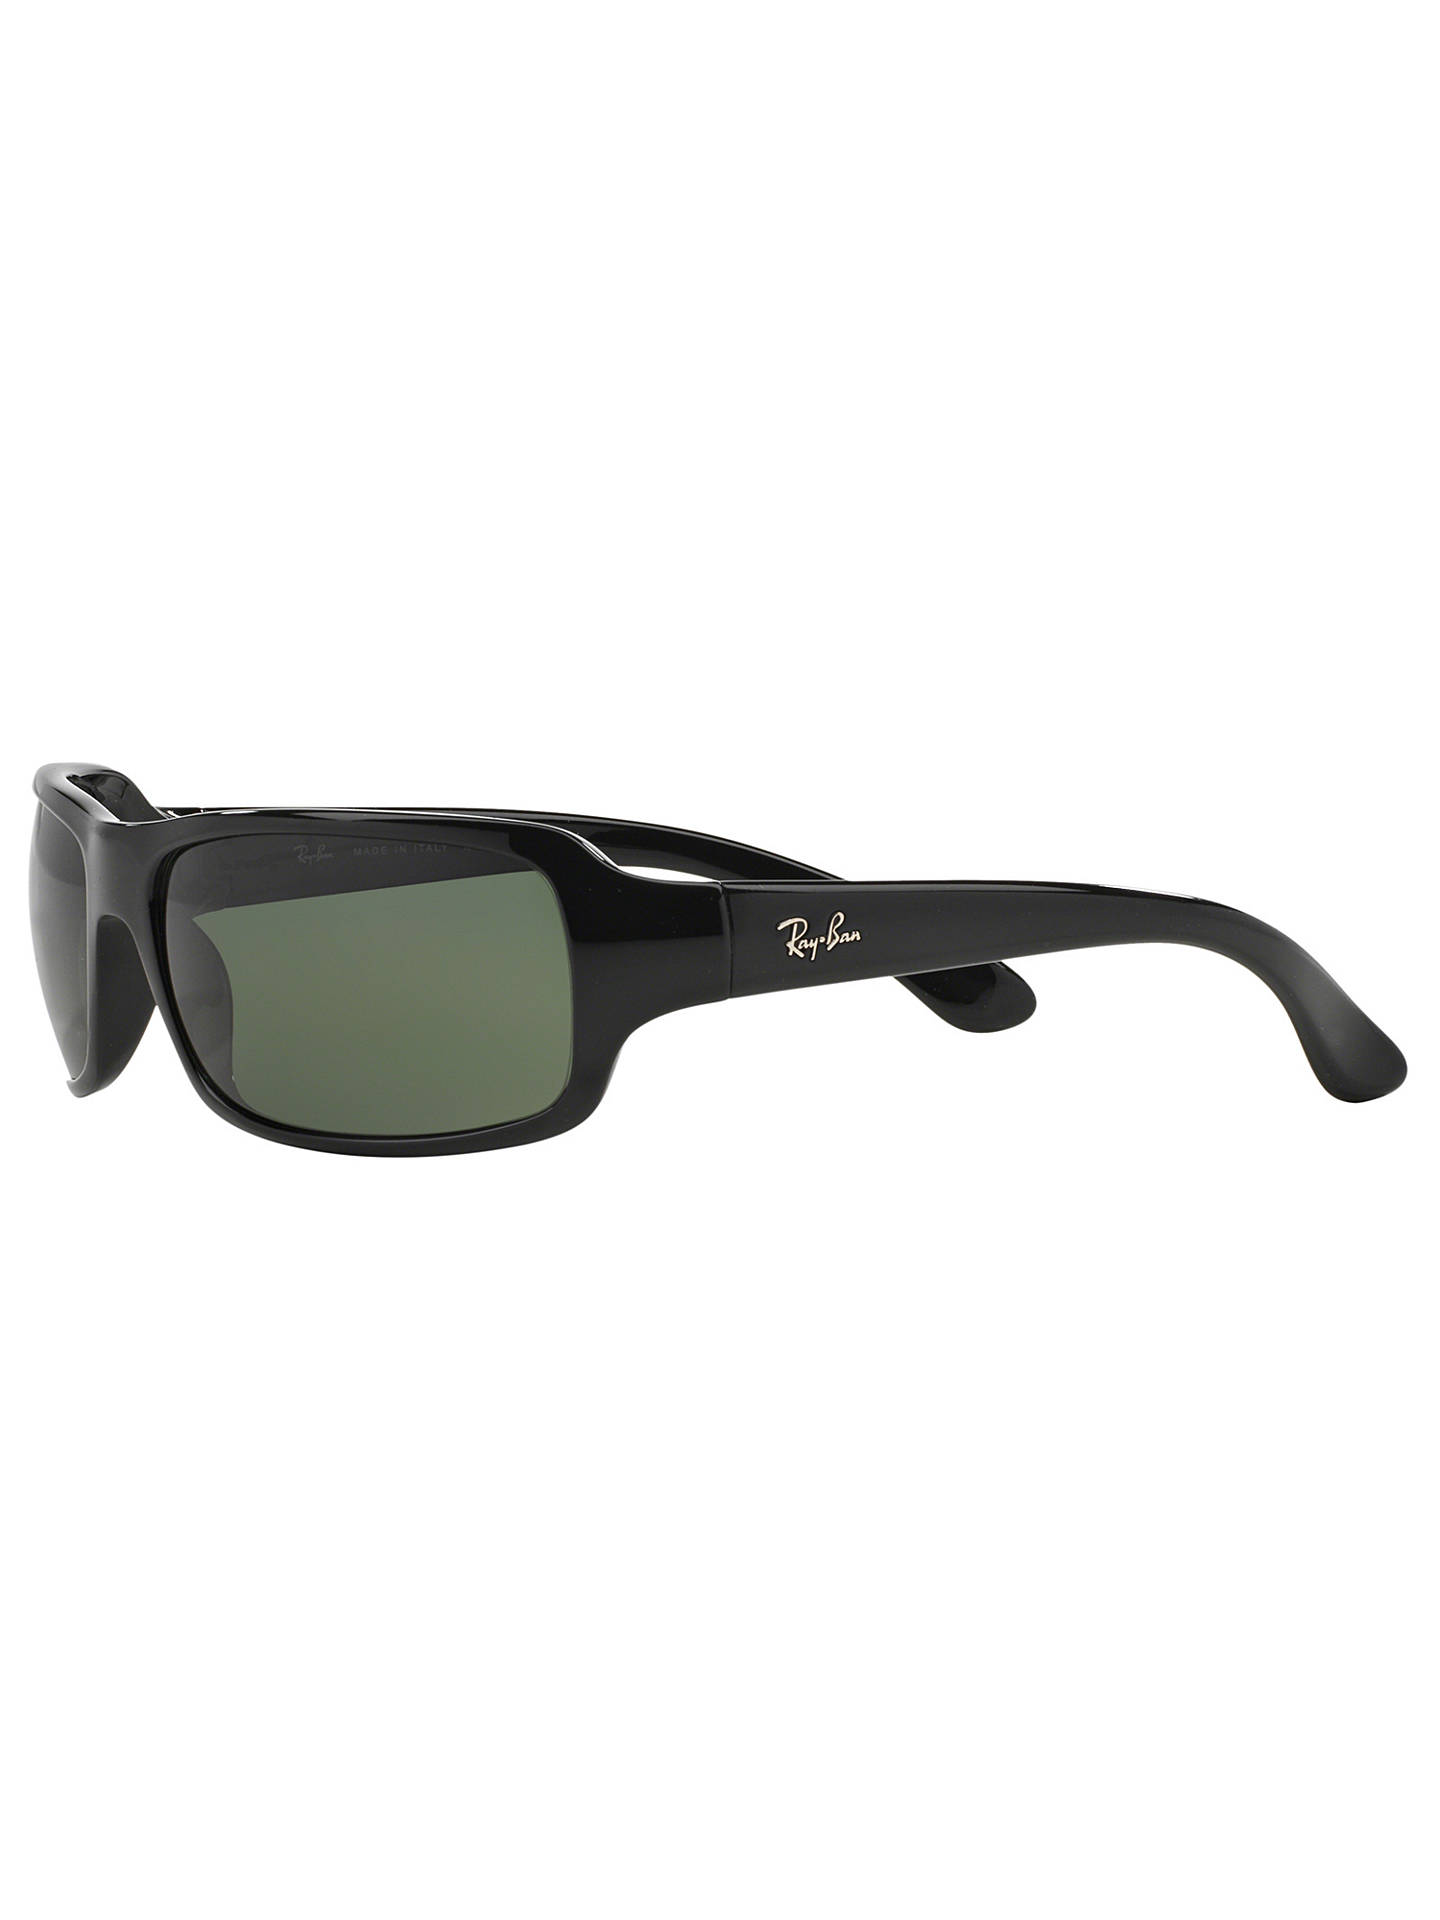 1f348501f1 ... get buyray ban rb4075 polarised rectangular sunglasses black dark green  online at johnlewis. e2368 c7fbe